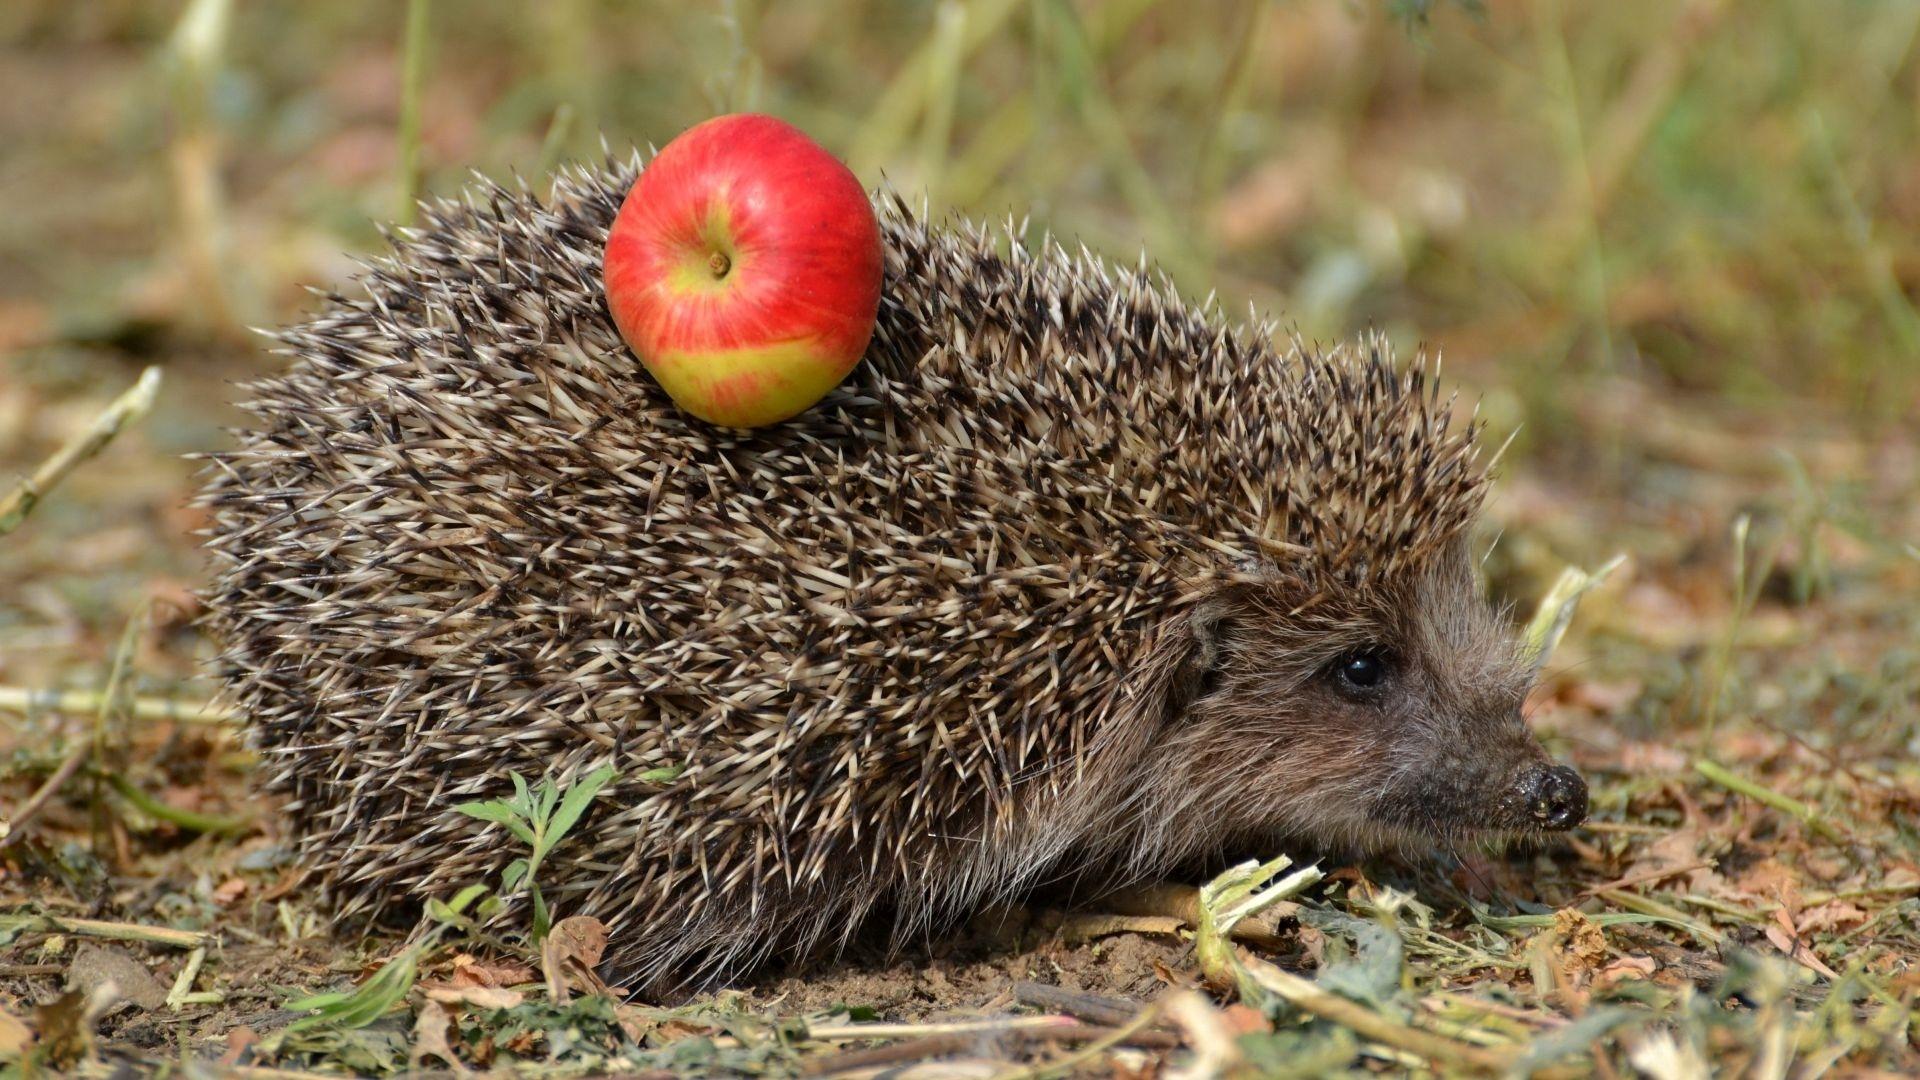 Hedgehog wallpaper for pc